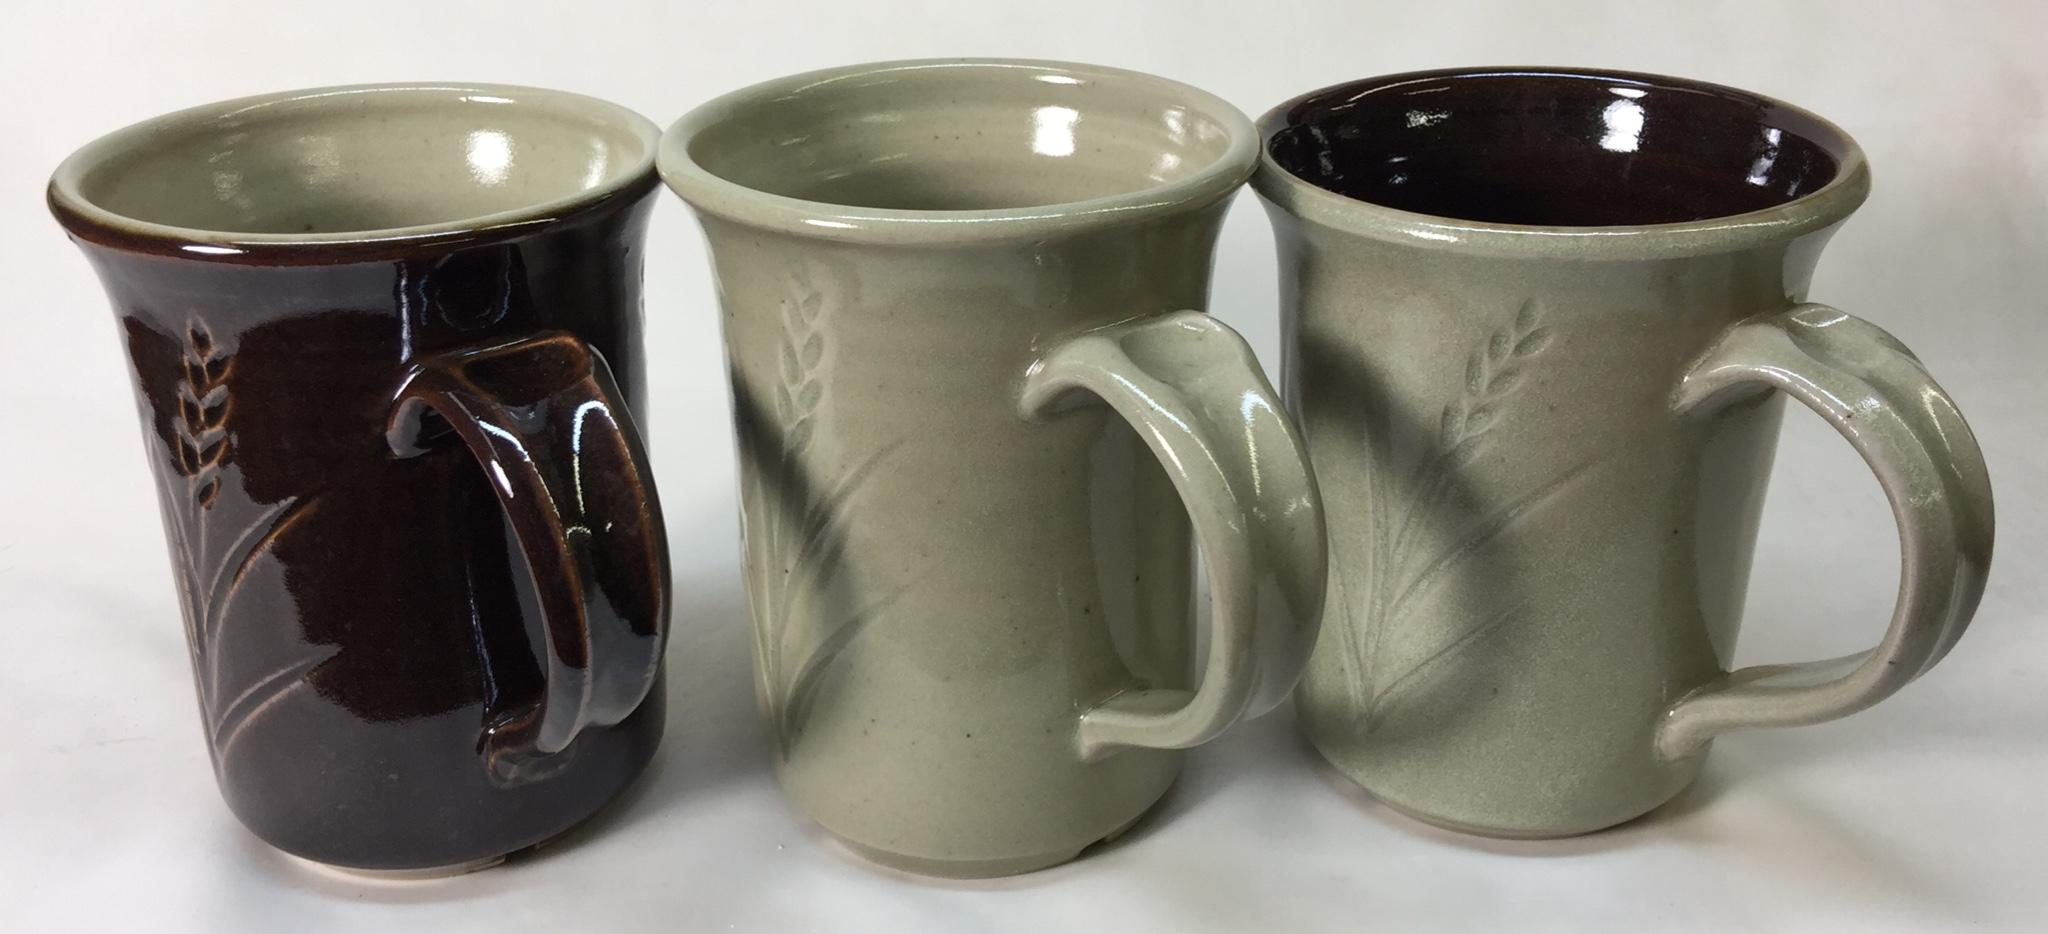 Laguna B-Mix Cone 10R mugs with Alberta and Ravenscrag glazes